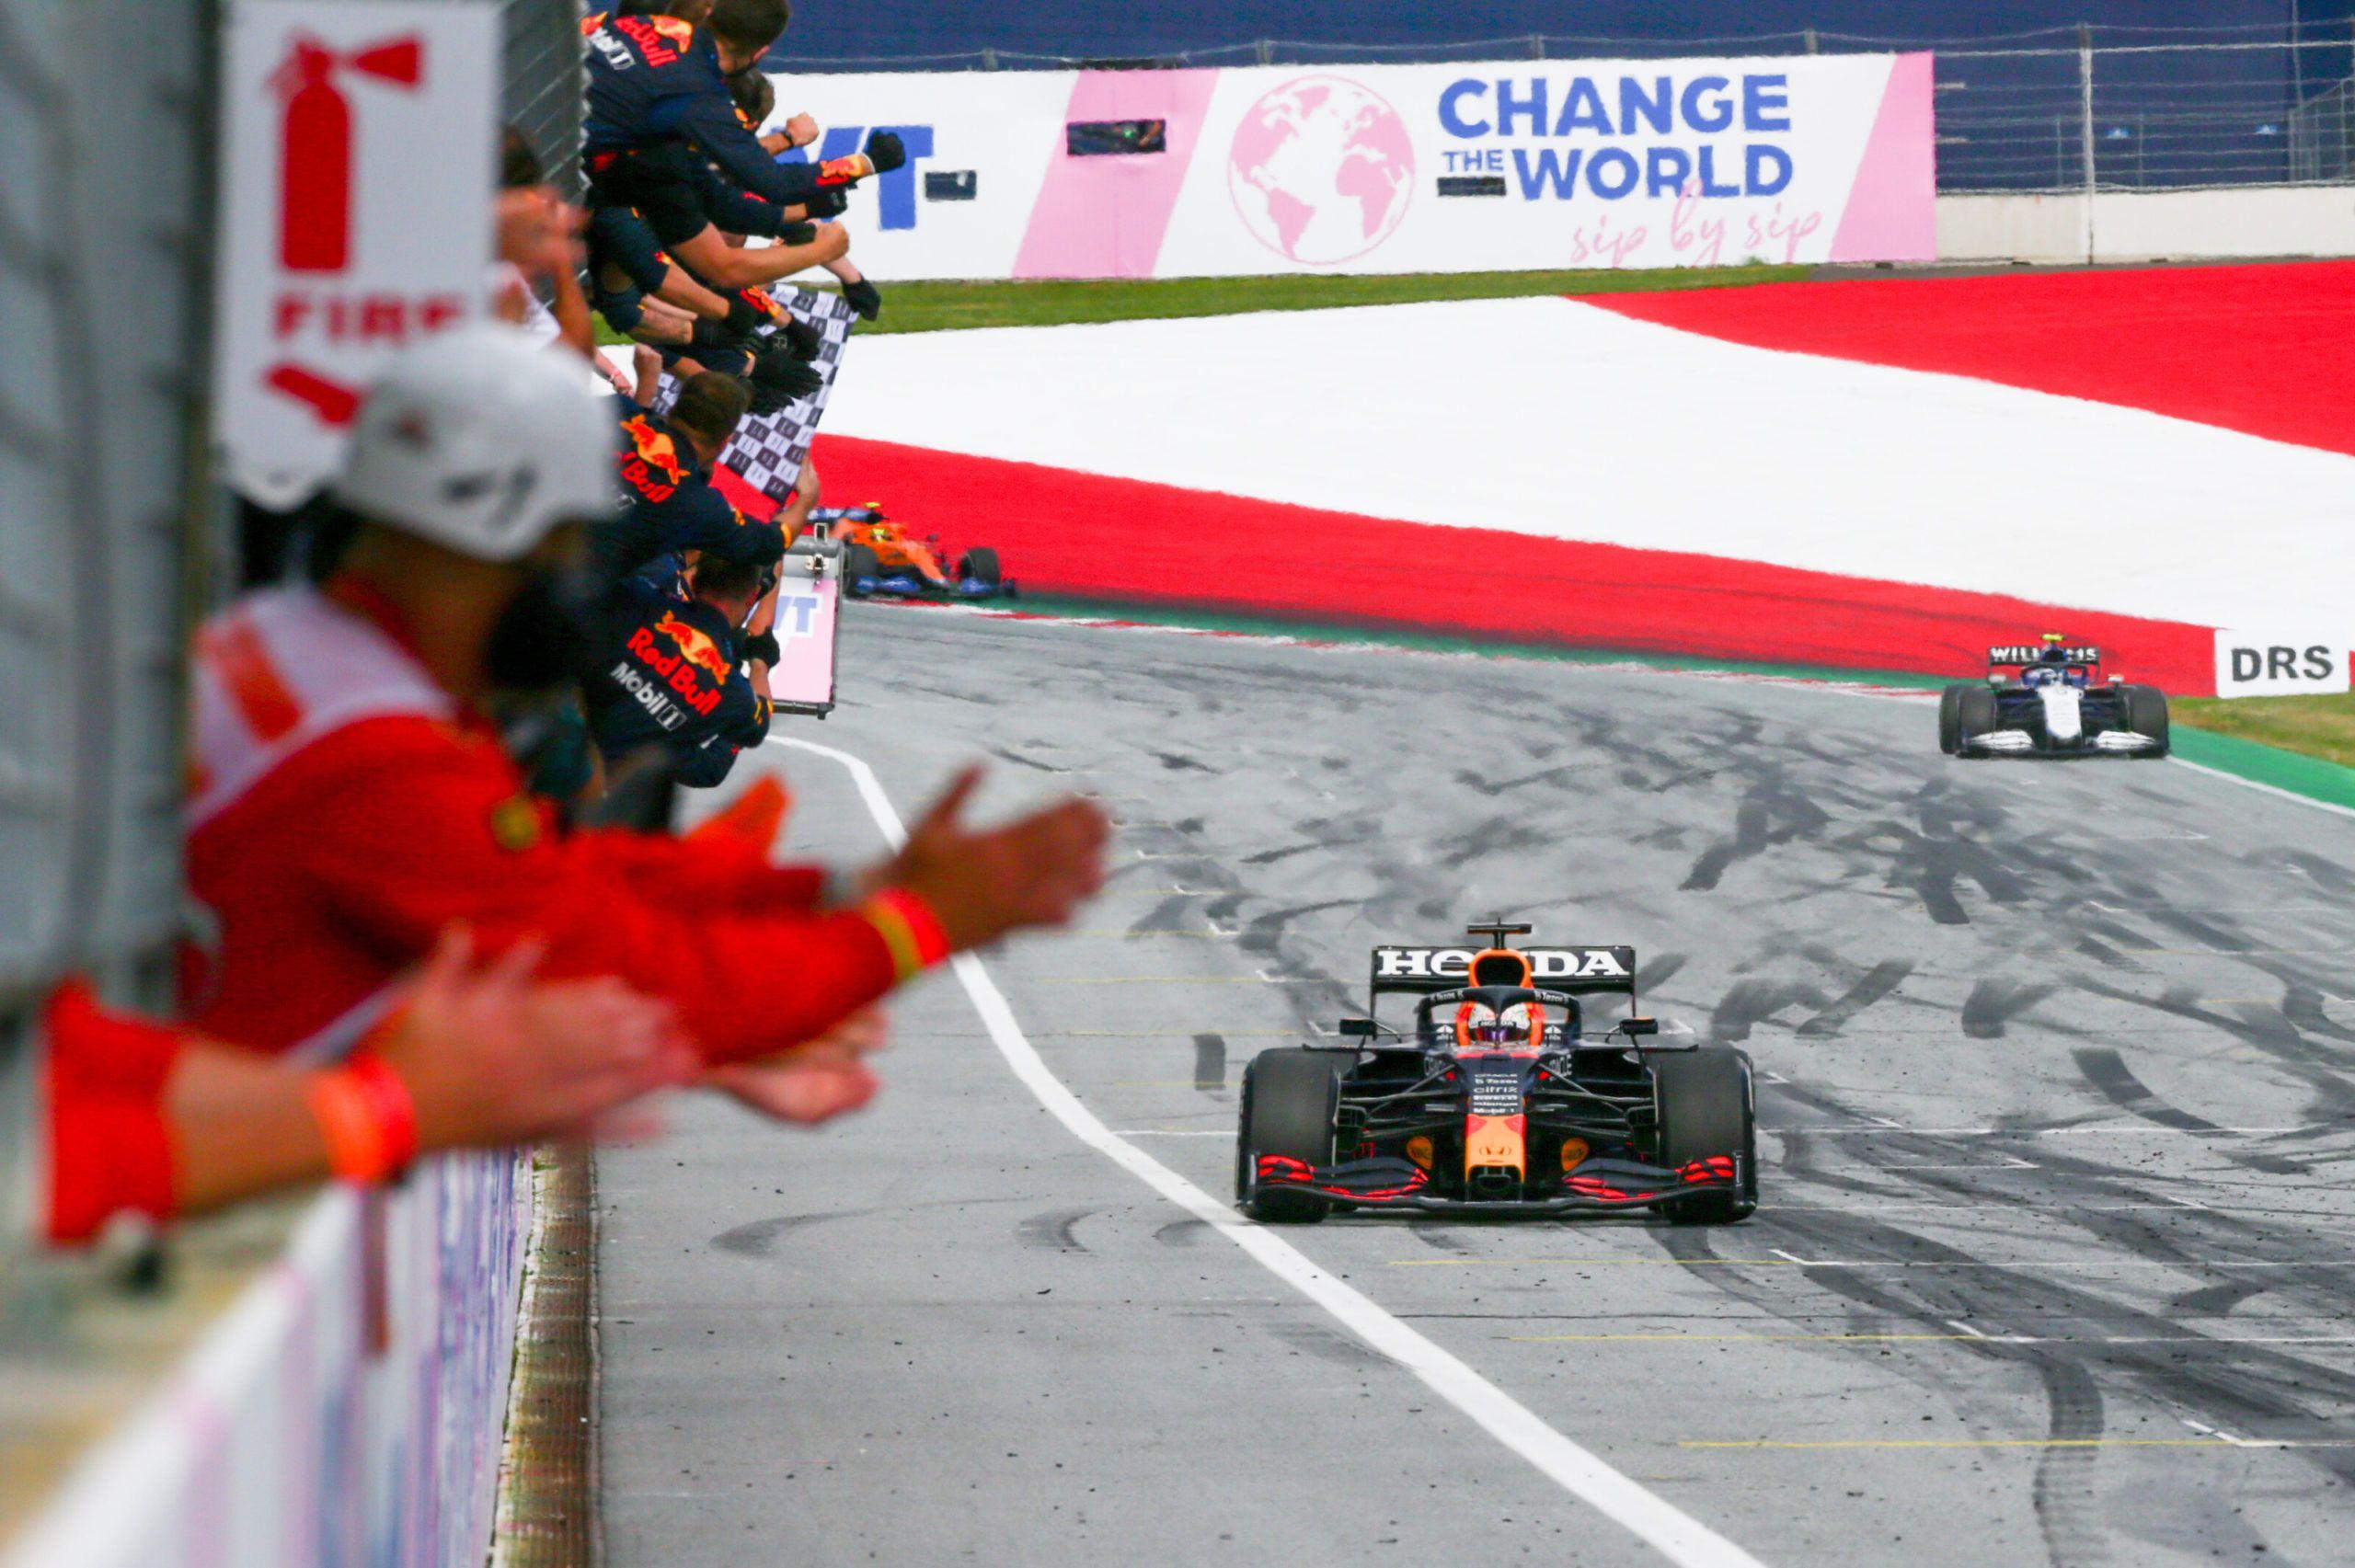 Max Verstappen, F1, FIA